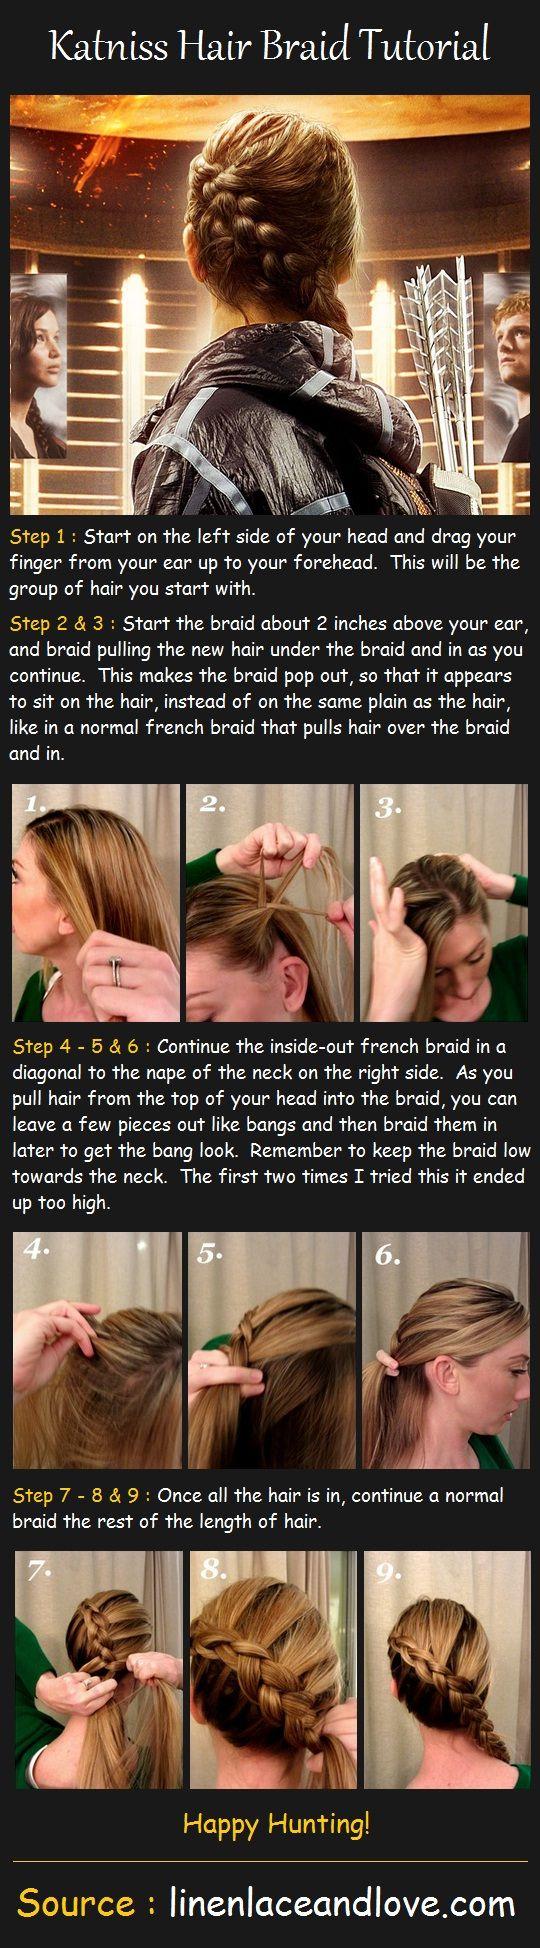 Katniss braid tutorial!